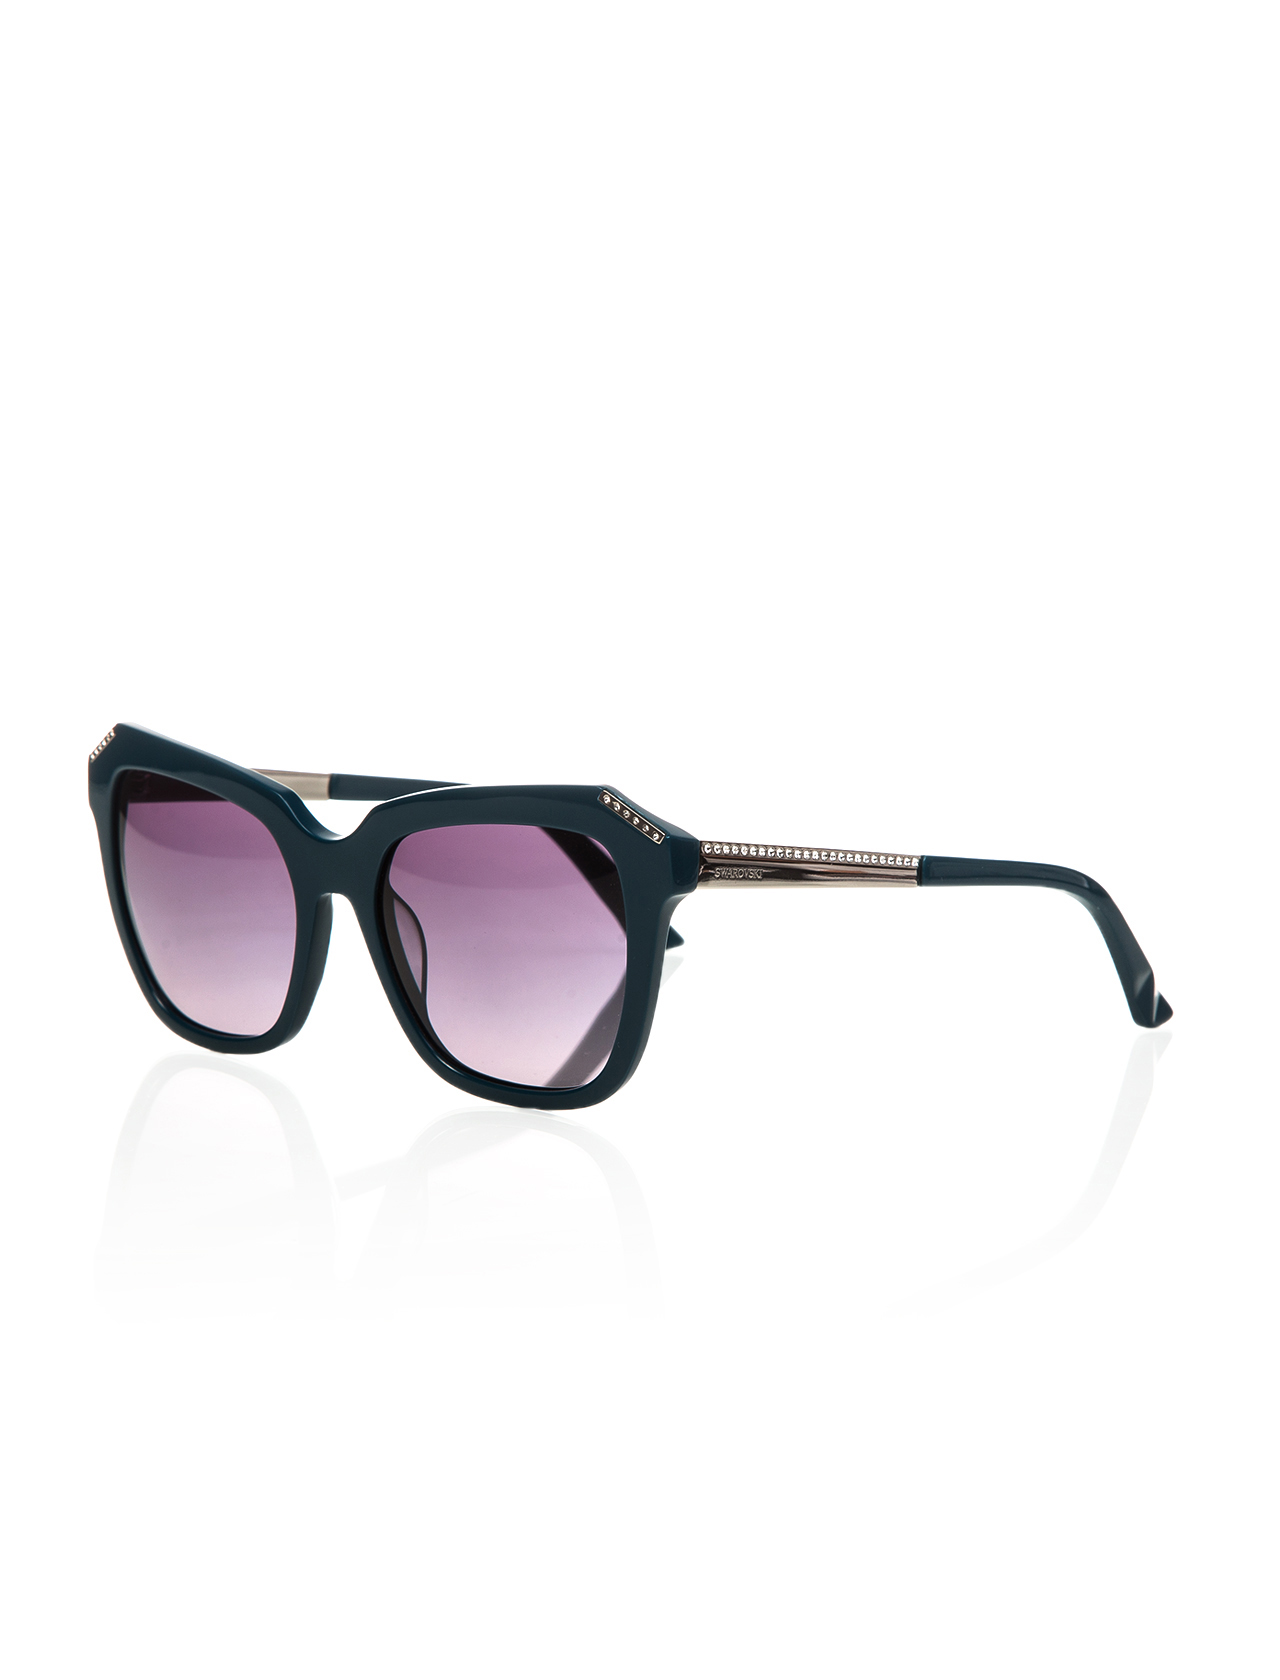 Women's sunglasses swr 0115 87b bone green organic 55-swarovski